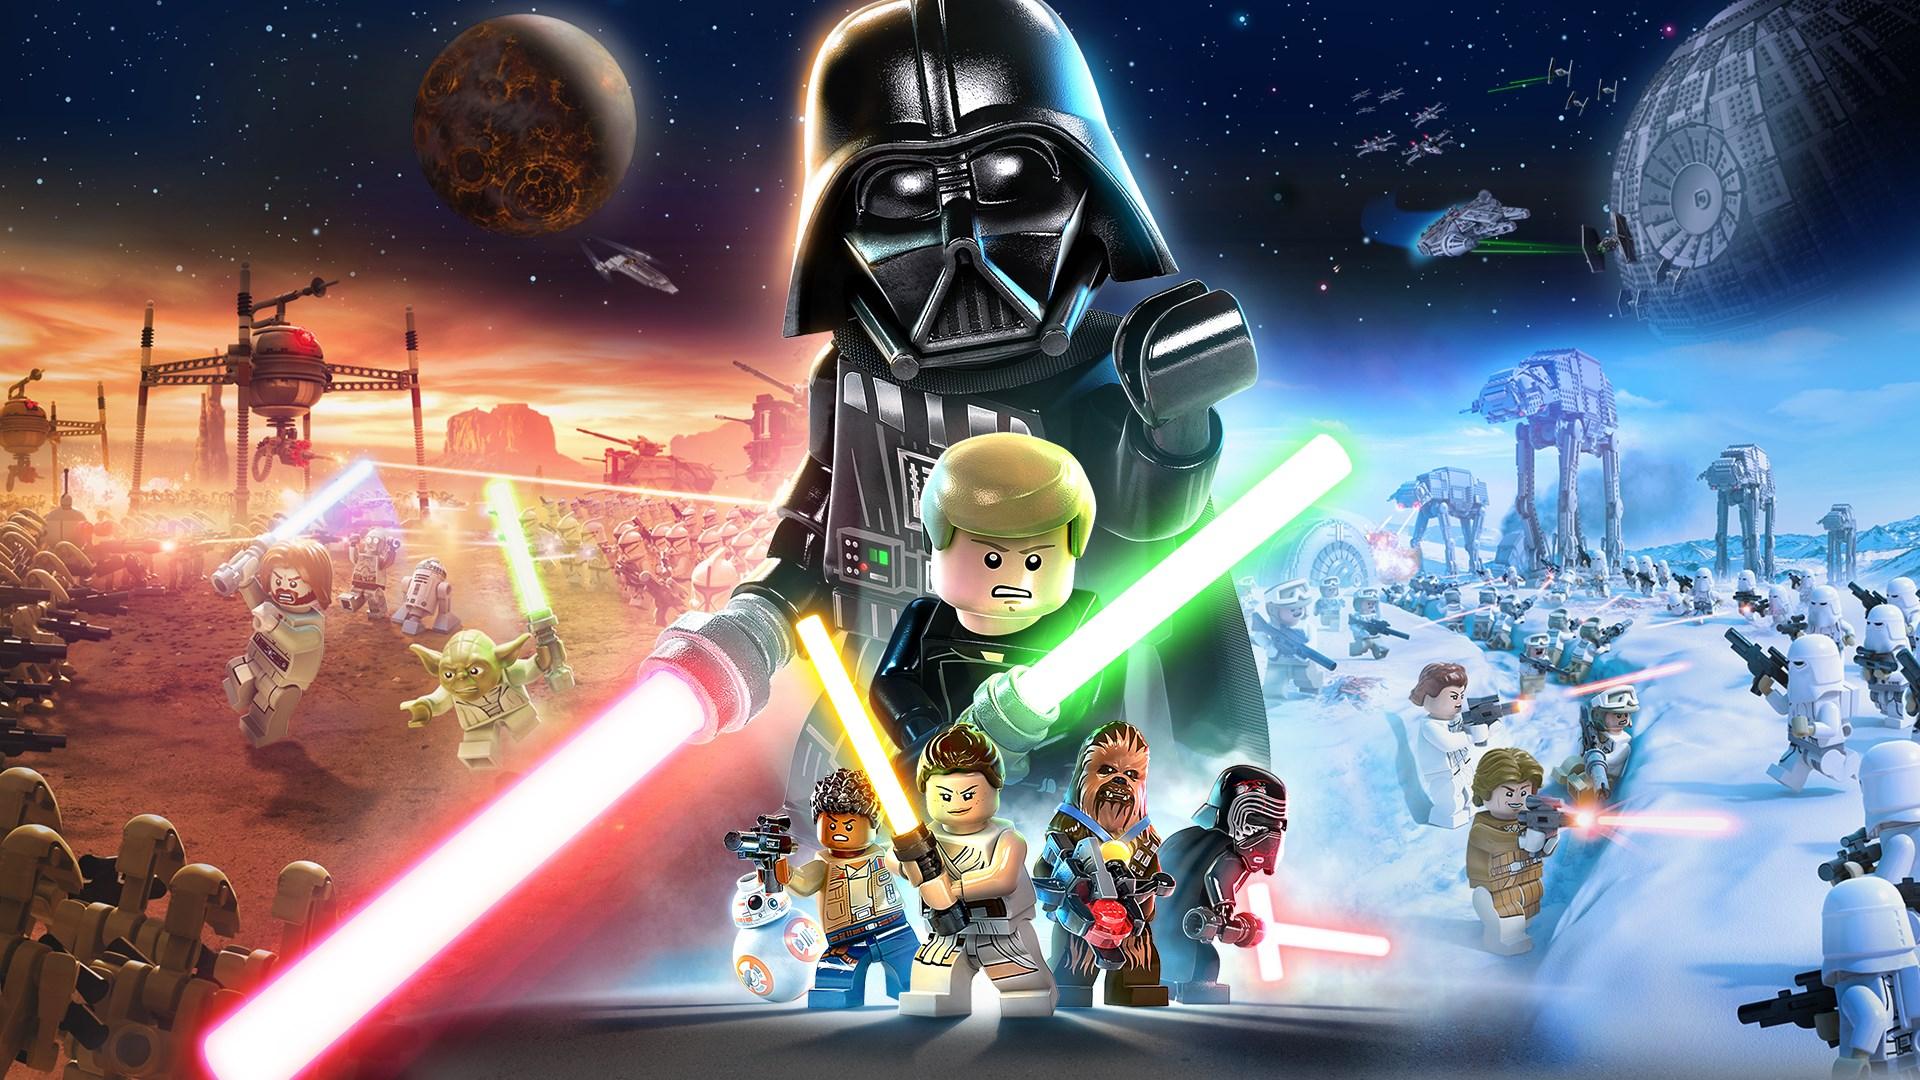 lego star wars the skywalker saga for pc xb1 ps4 xbxs